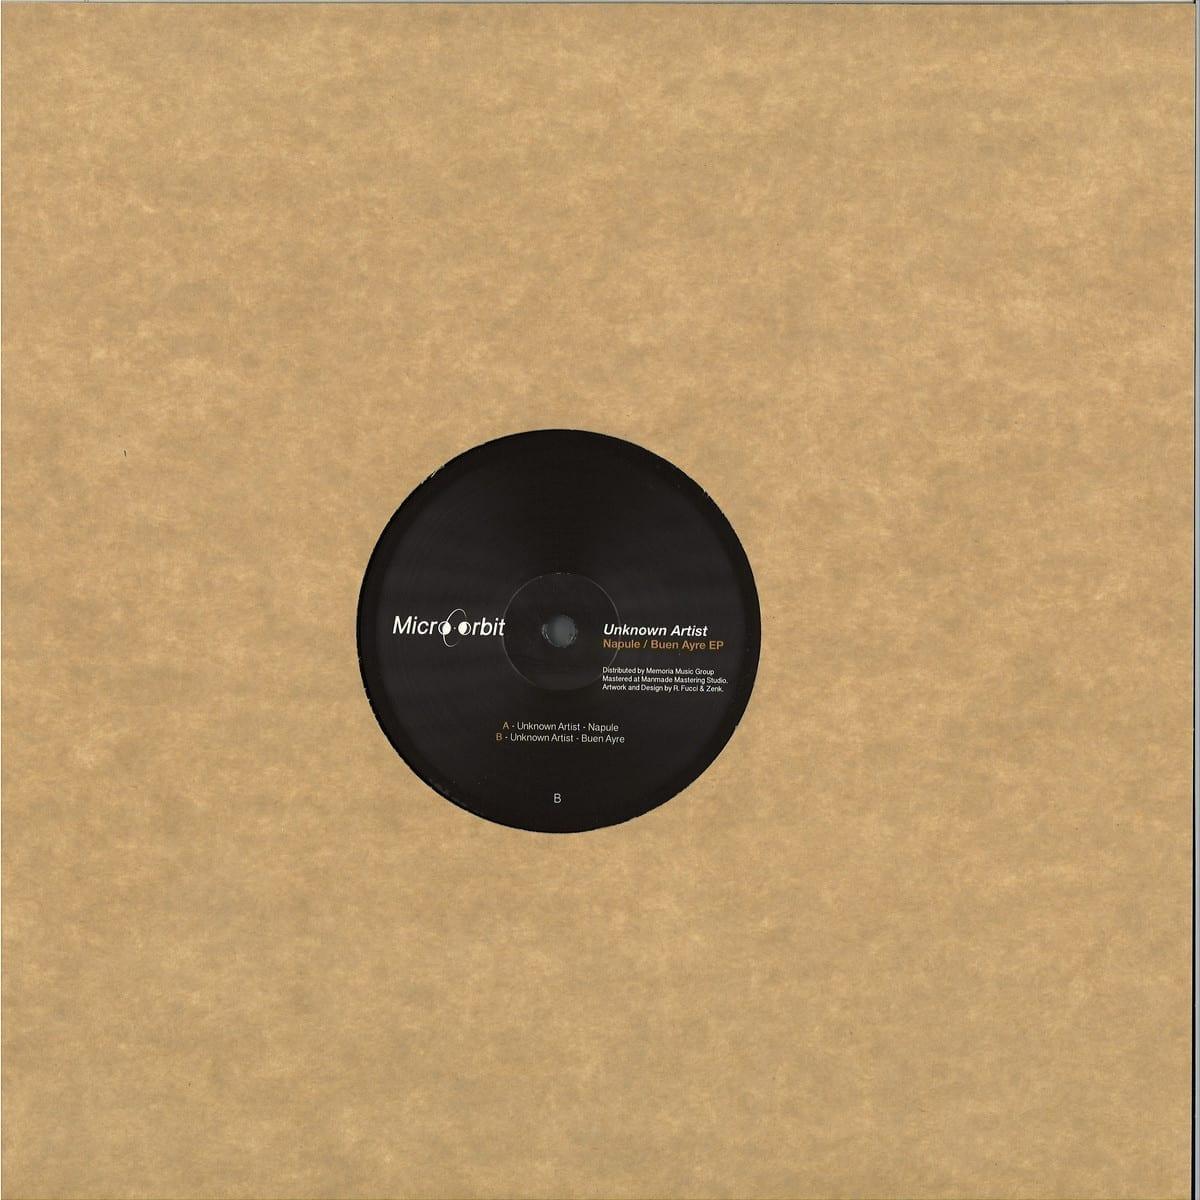 Unknown Artist - Napule Buen Ayre EP [Micro Orbit Records] back